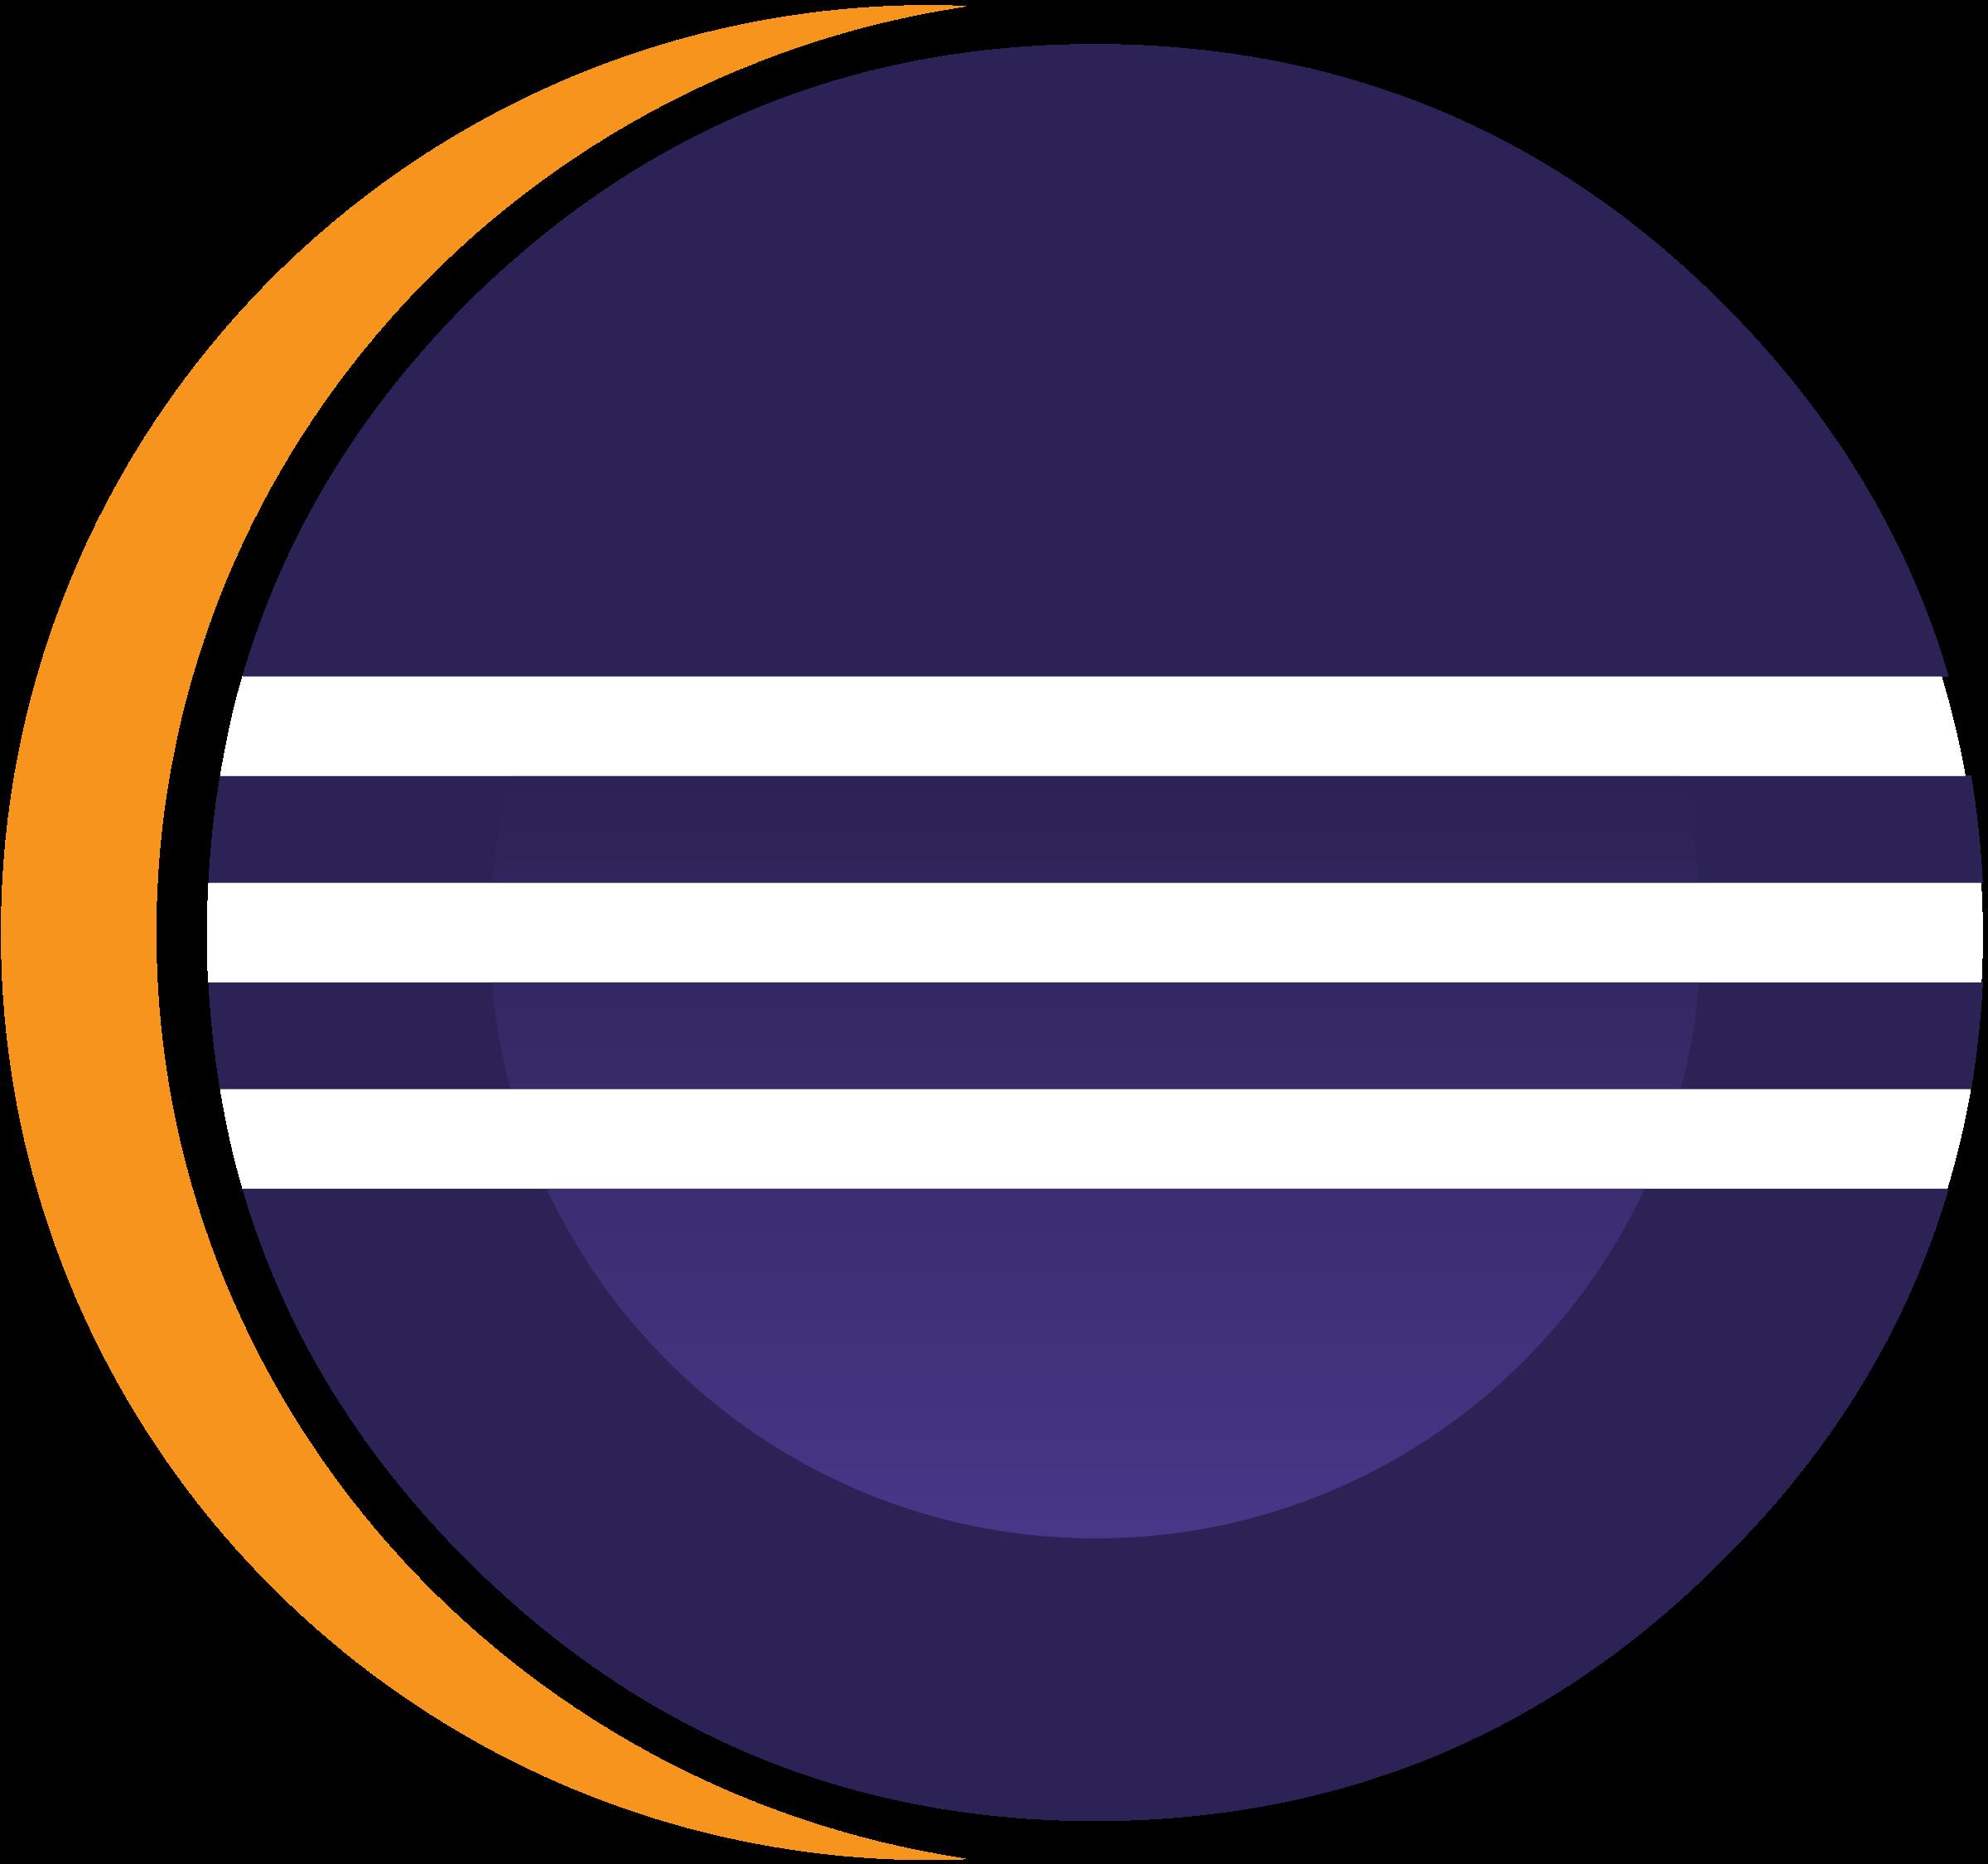 Eclipse Logo PNG Transparent & SVG Vector - Freebie Supply